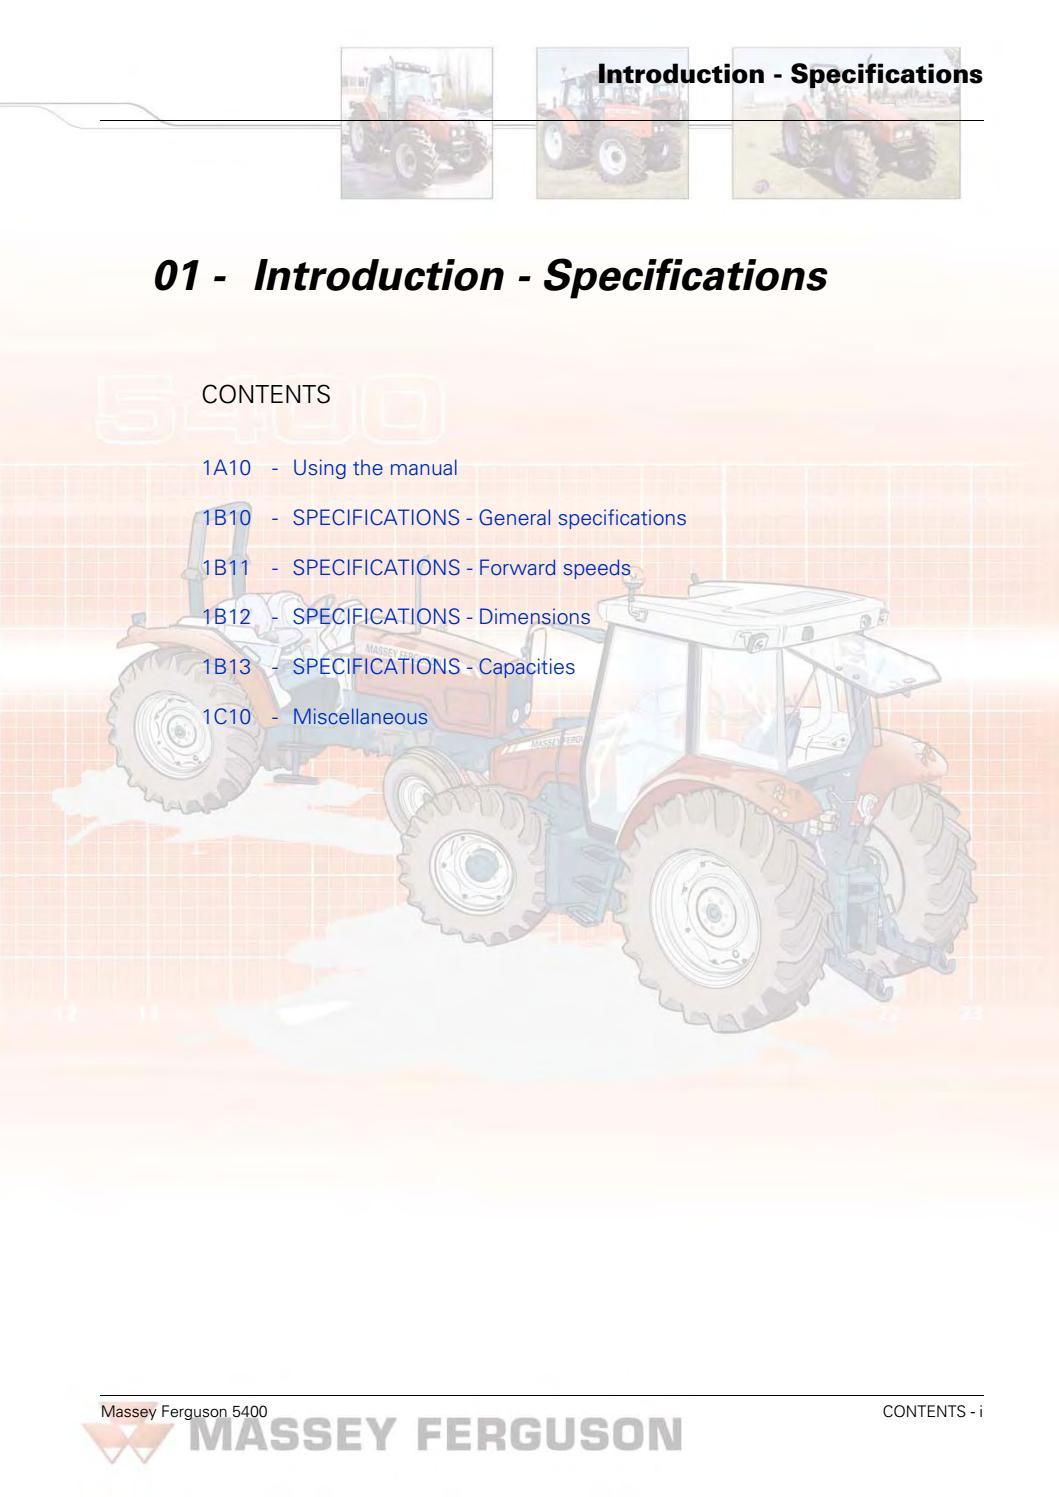 Massey ferguson mf 5445 tractor service repair manual by jjhsefyu7ds - issuu